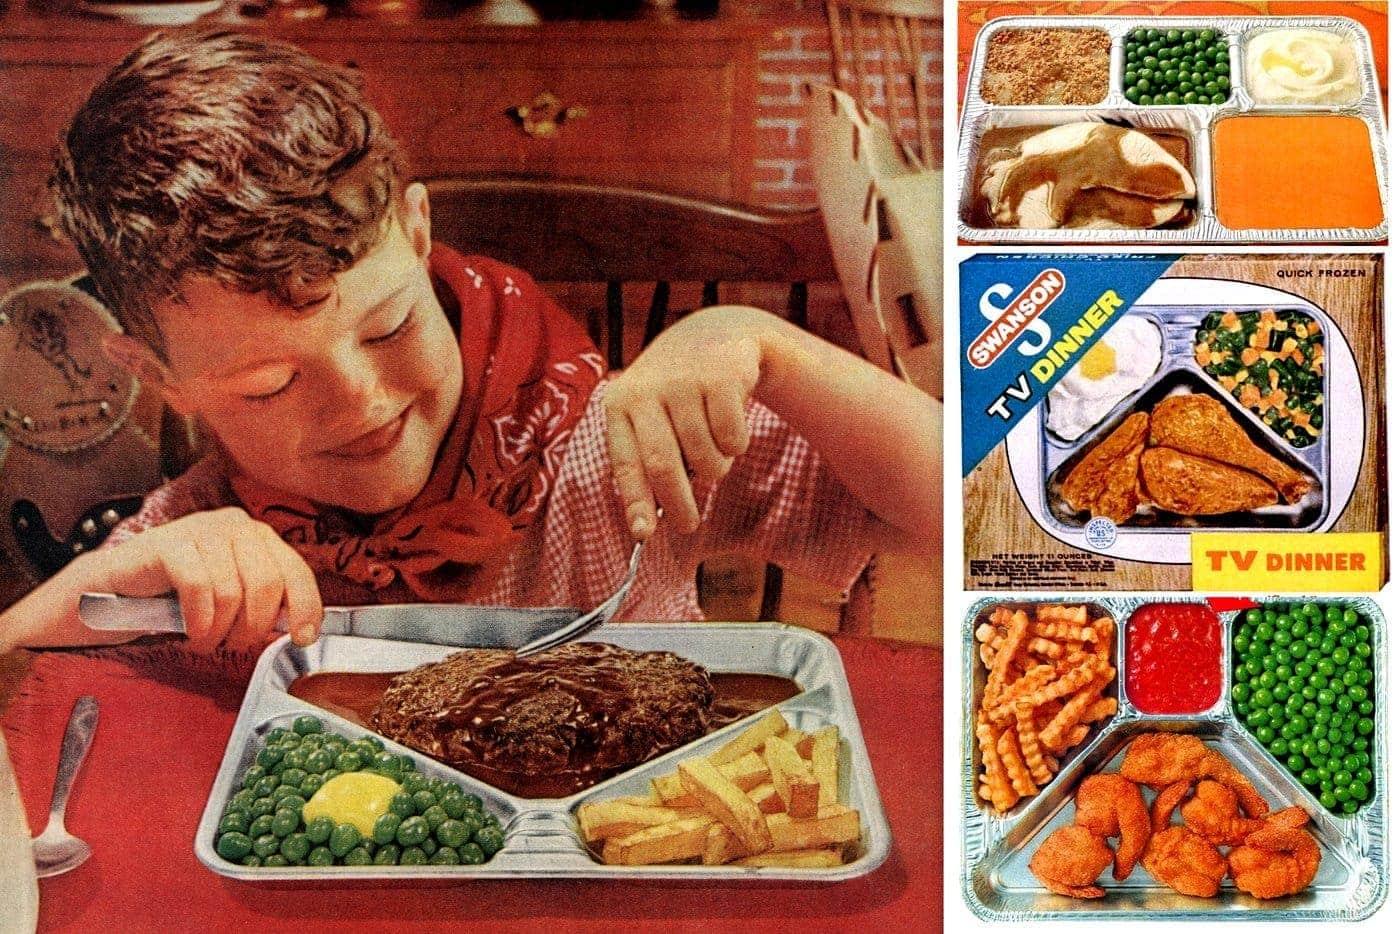 30 vintage TV dinners: Fried chicken, turkey, pot roast & other fab